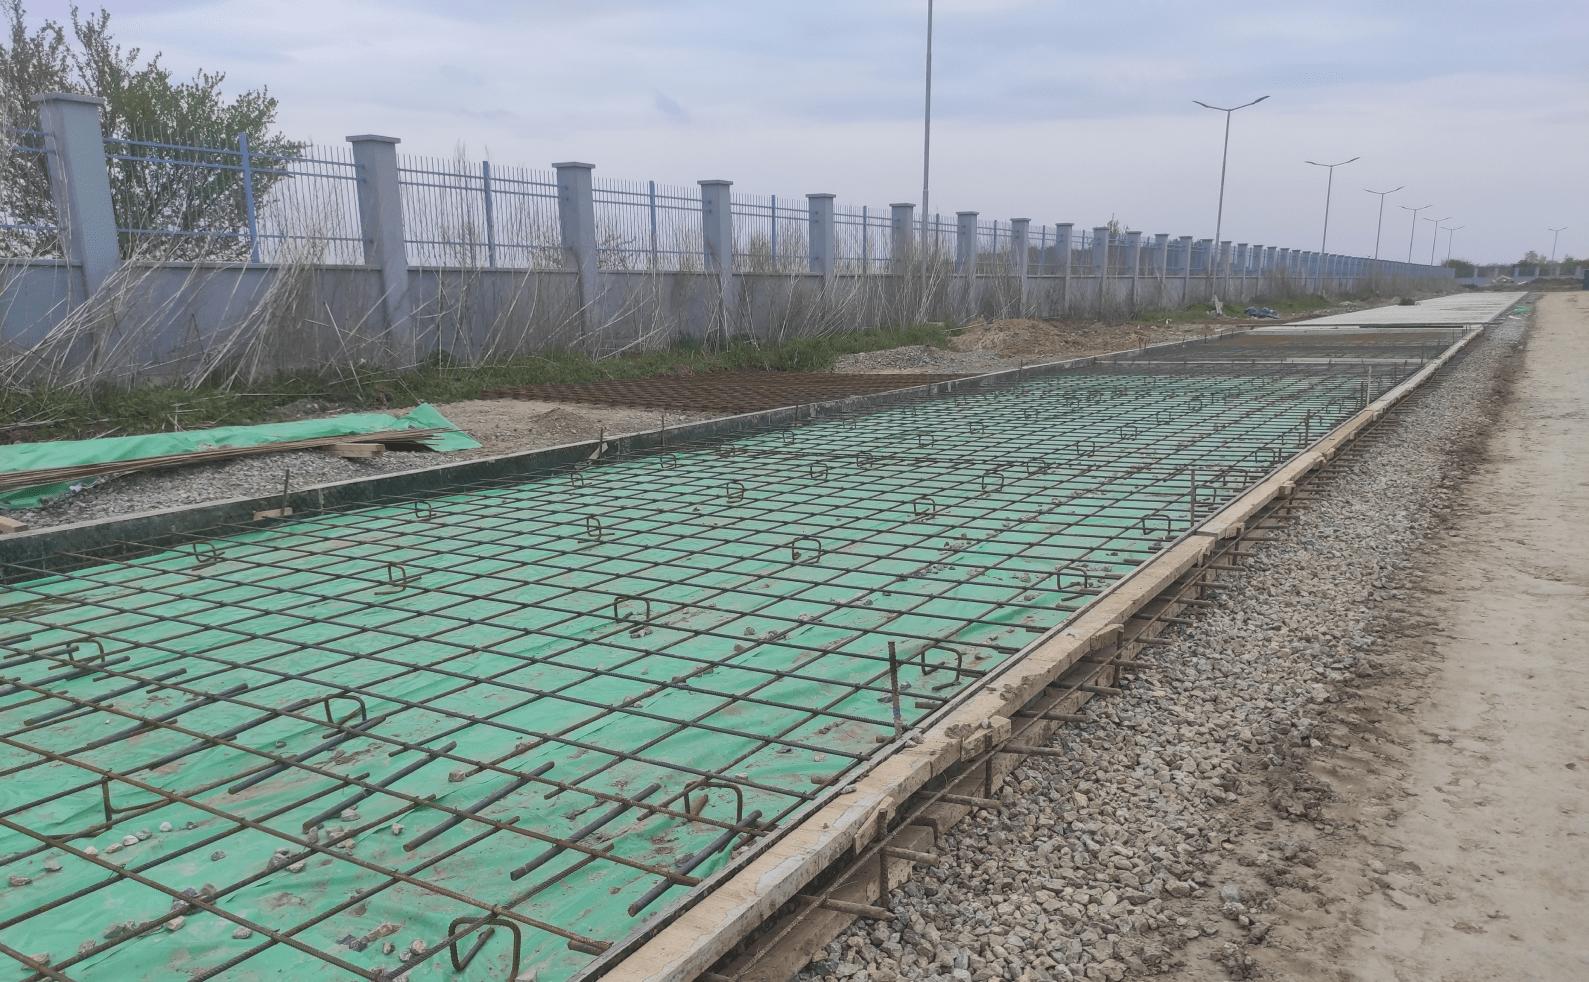 industrijski-objekti-fabrika-guma-ling-long-2